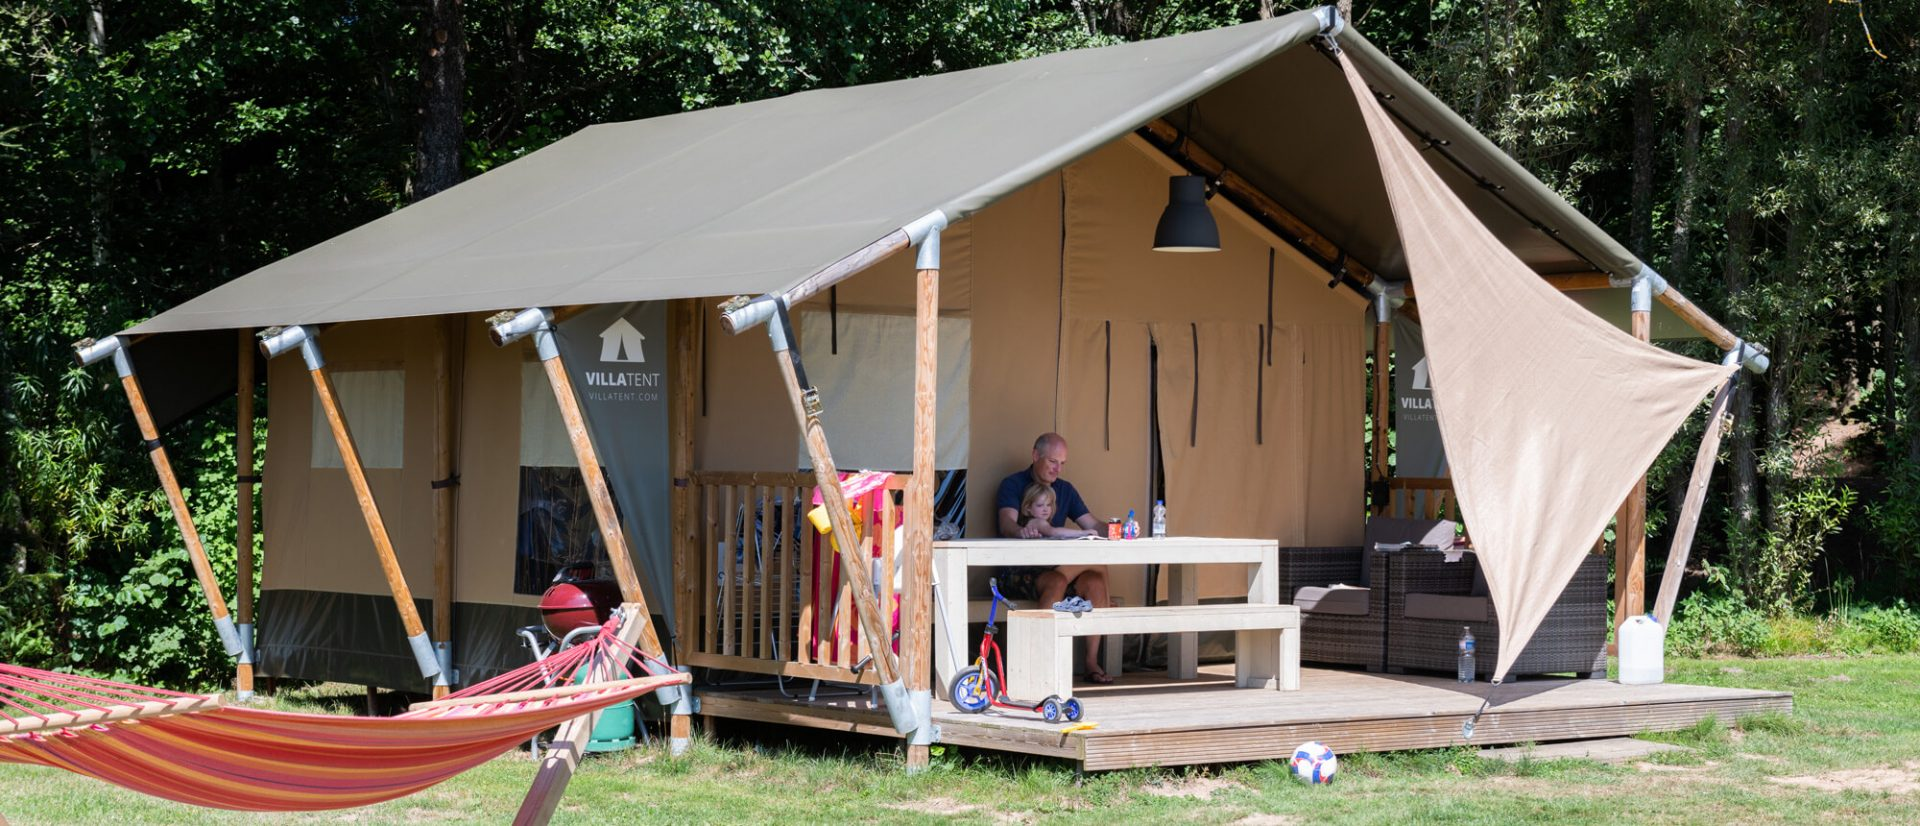 Camping Clos De La Chaume : 5 Campingclosdelachaume Photobenoitfacchi 8961